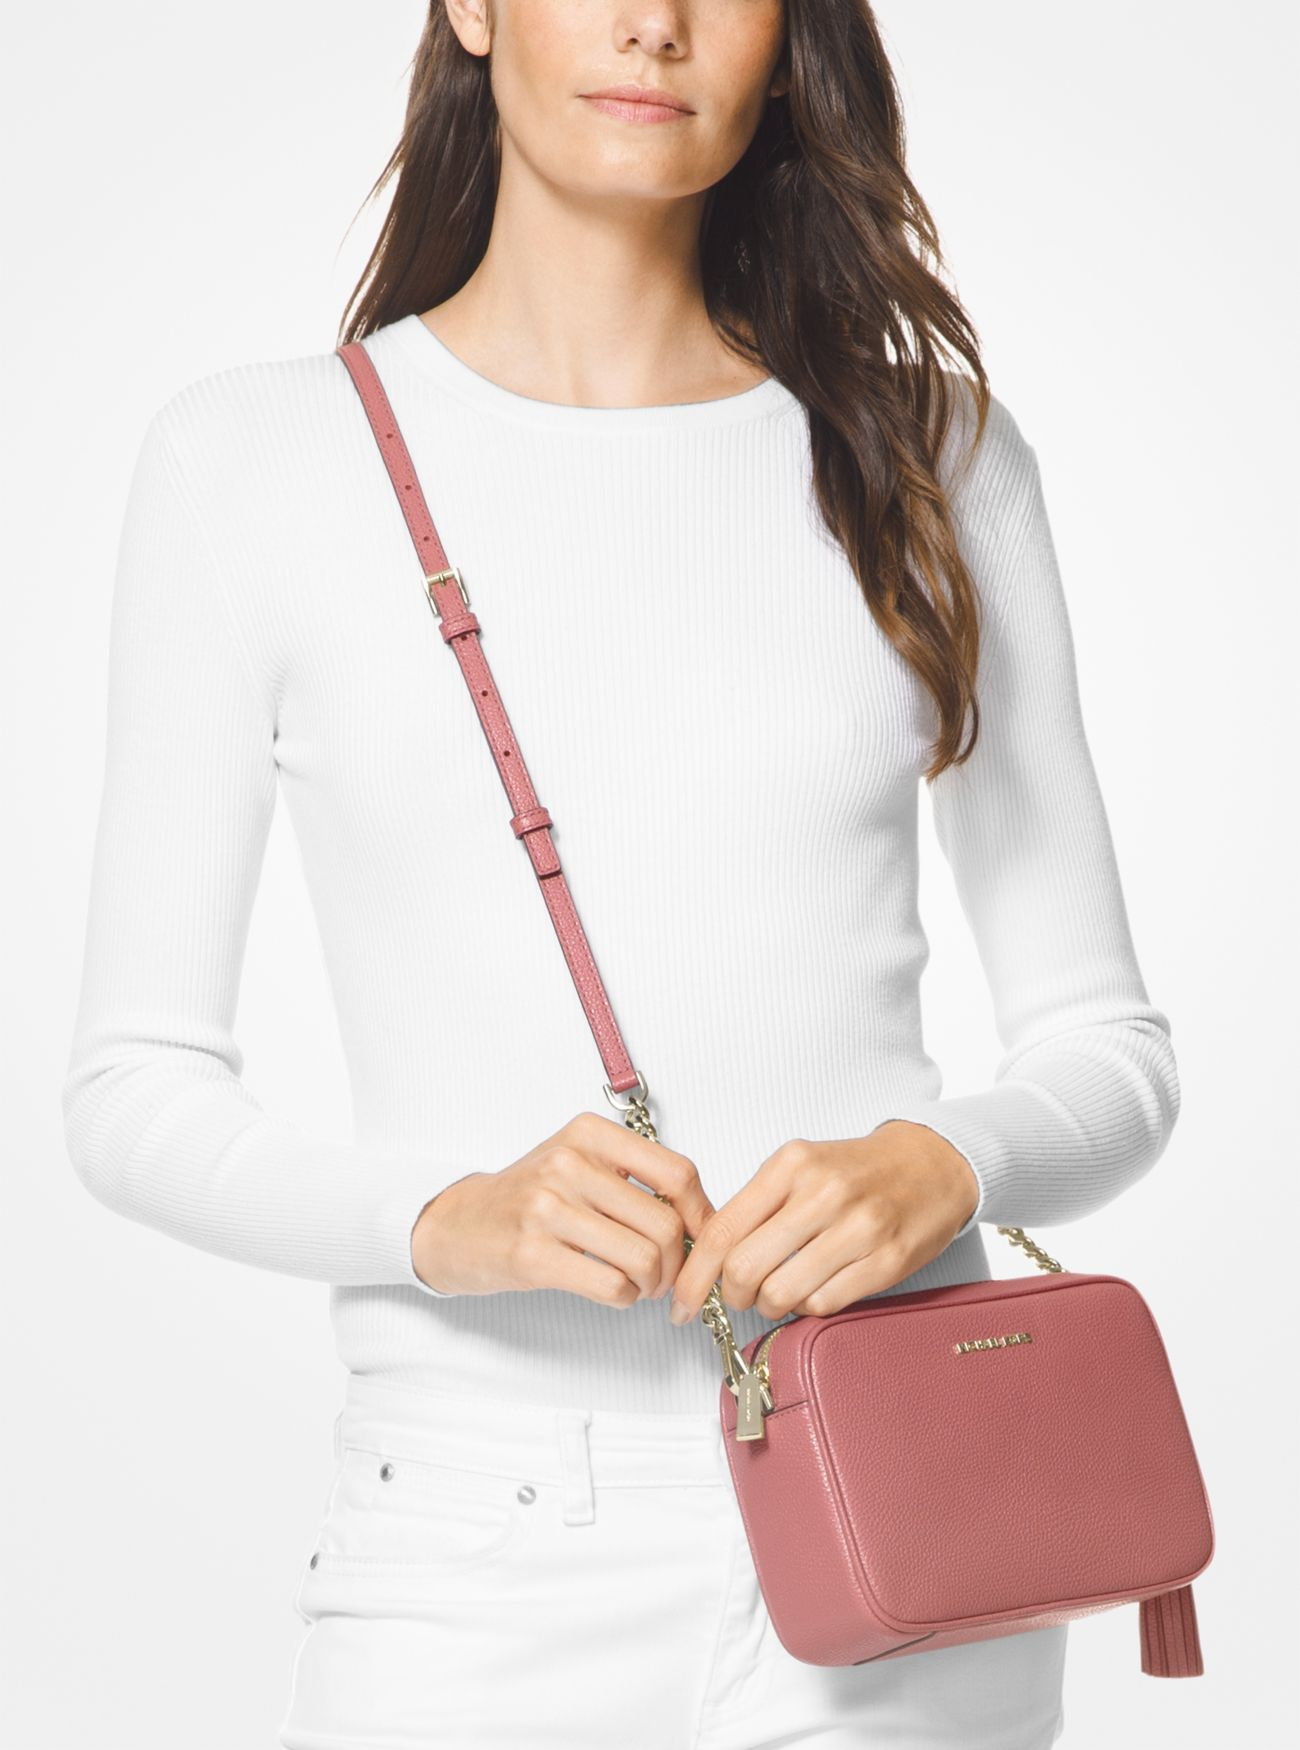 e6105cef9bd14 ... Ginny Medium Pebbled Leather Crossbody Bag. MICHAEL Michael Kors